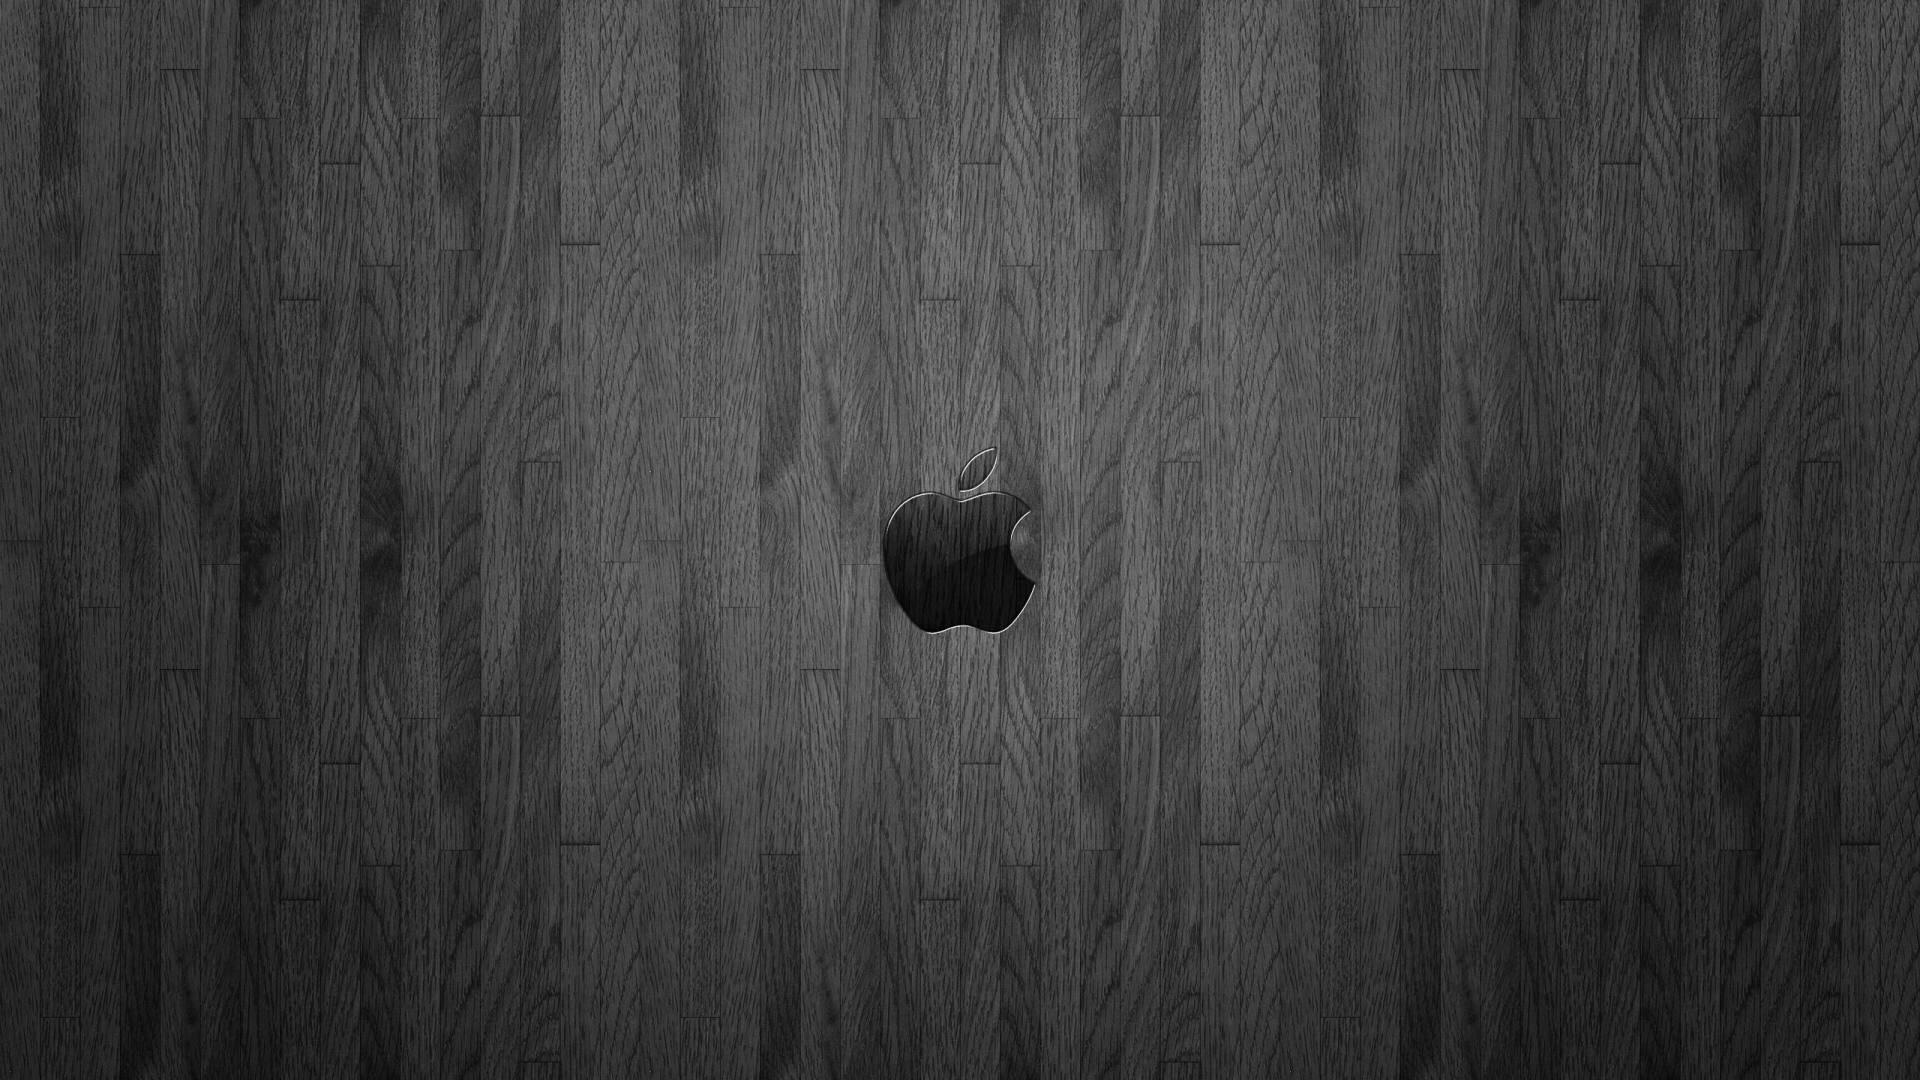 hd pics photos best beautiful apple logo texture gray wood hd quality desktop  background wallpaper